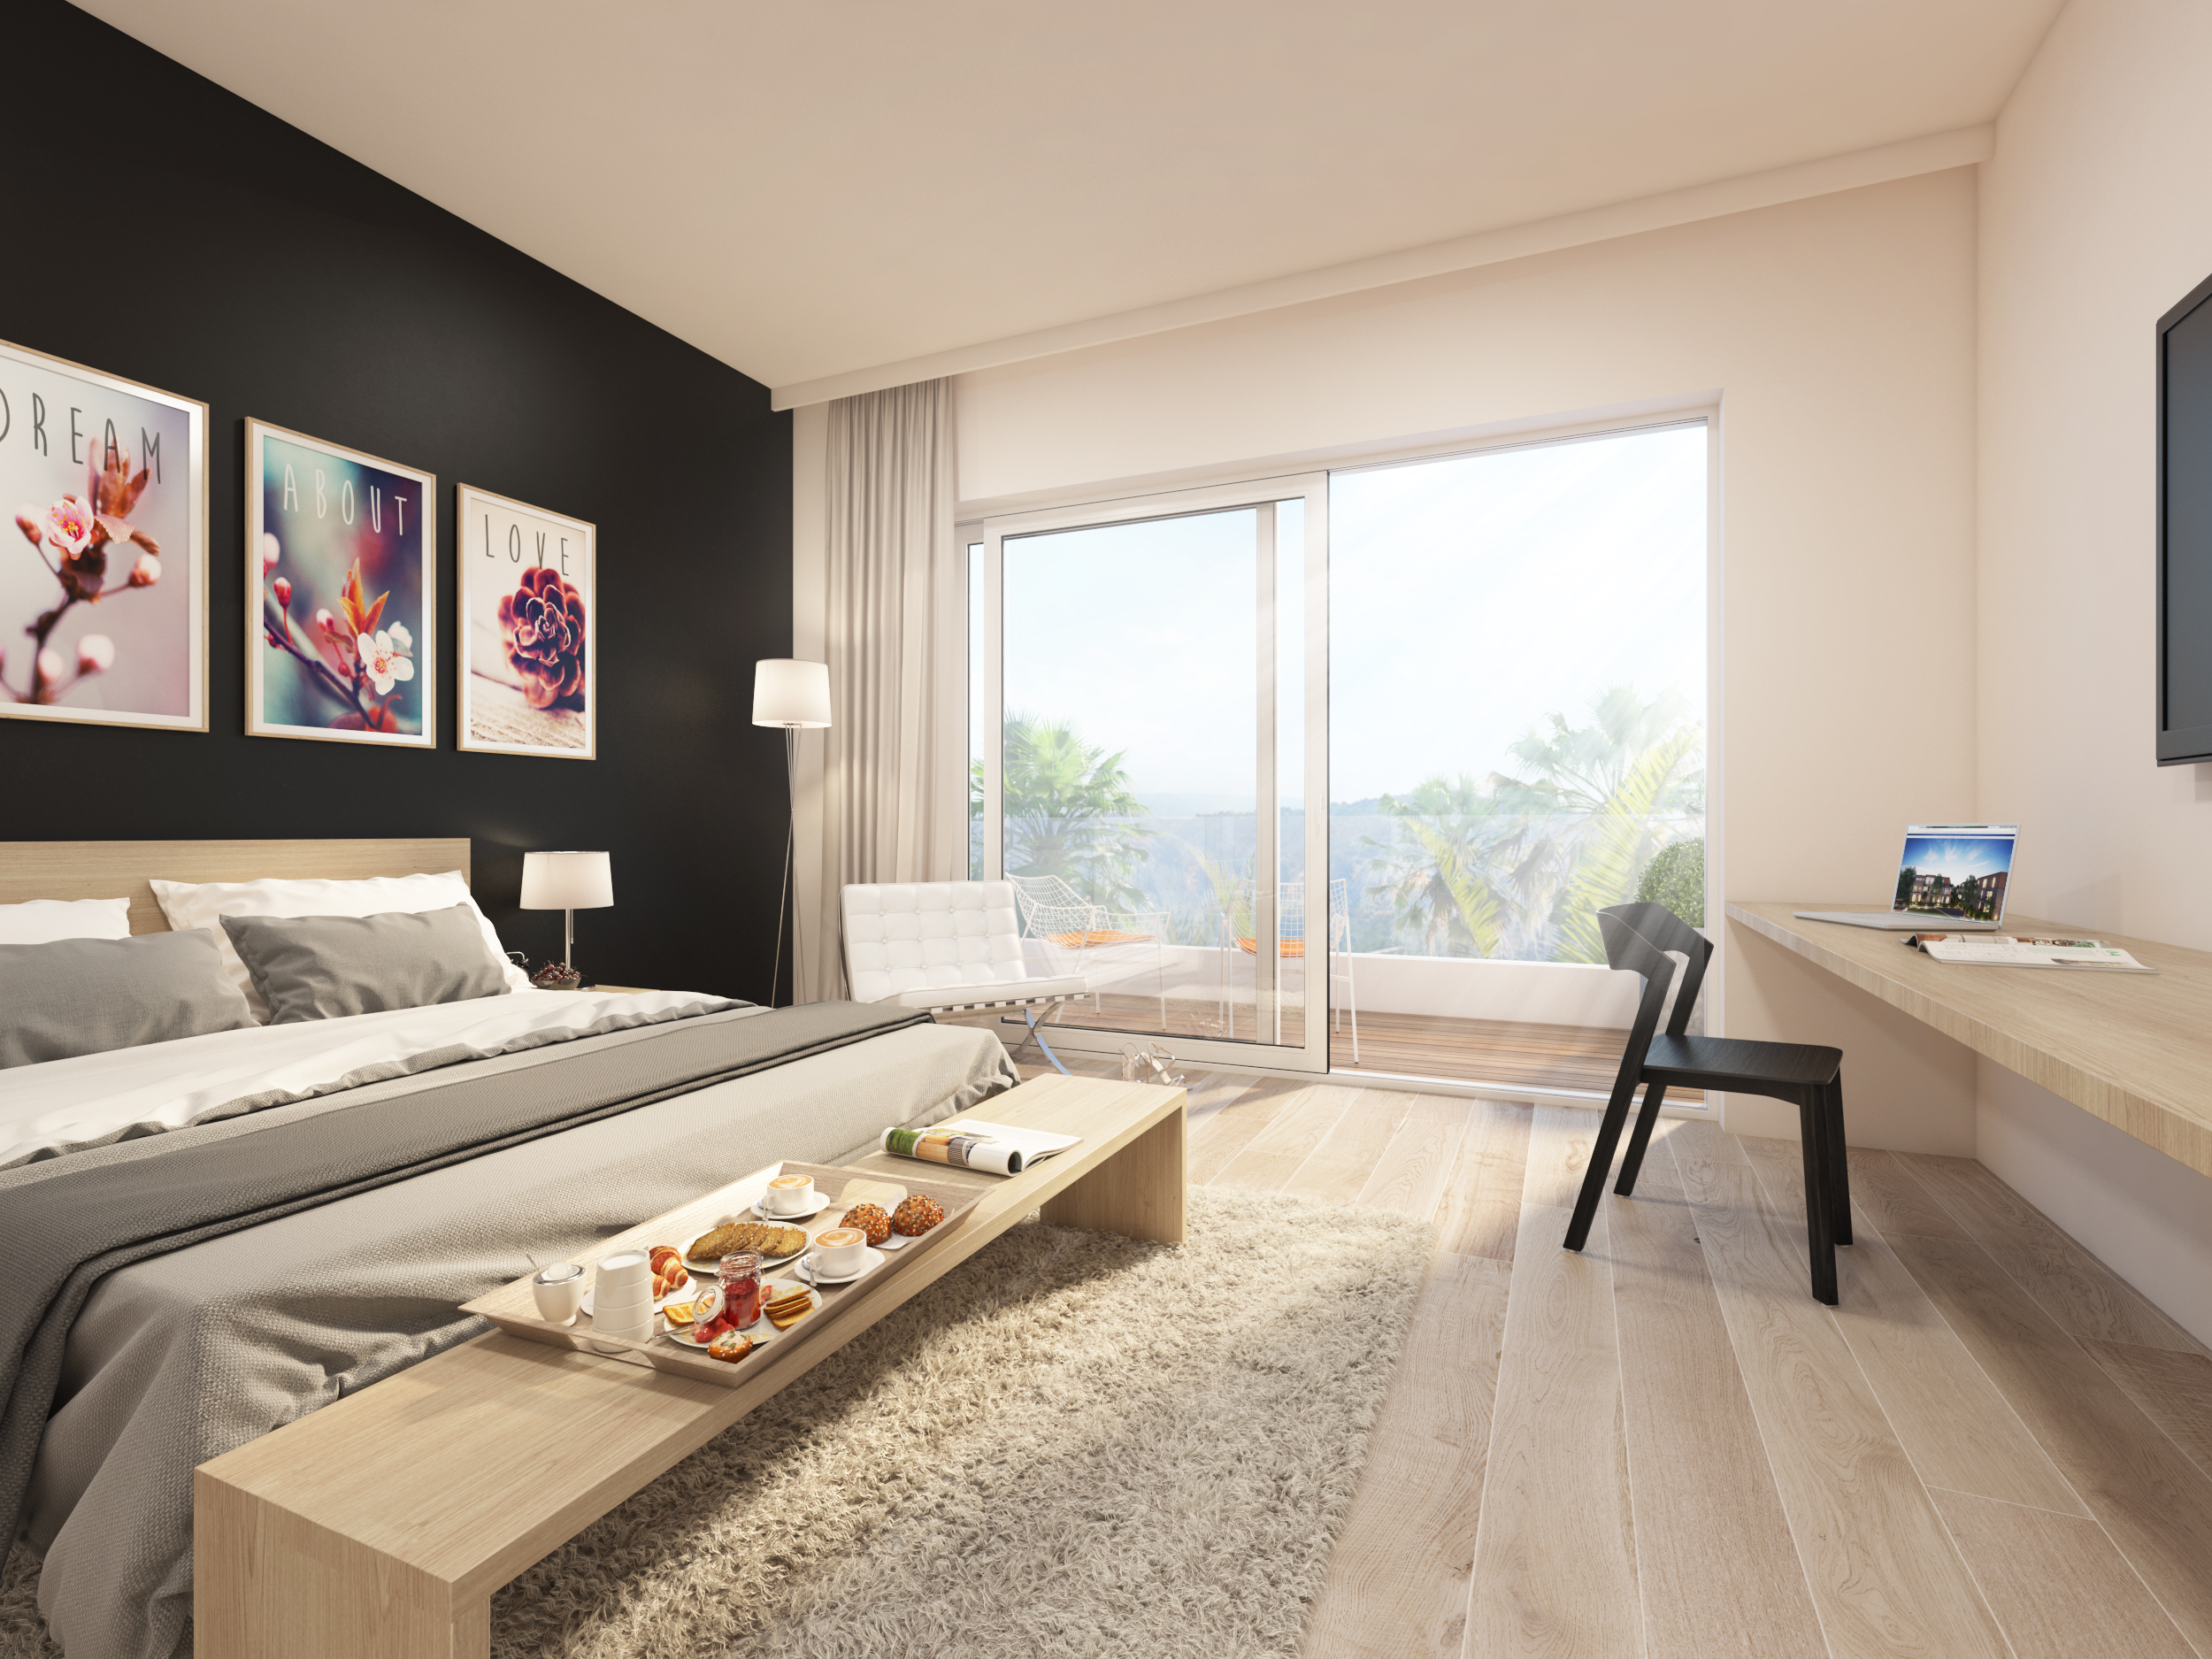 16053_bedroom02.jpg